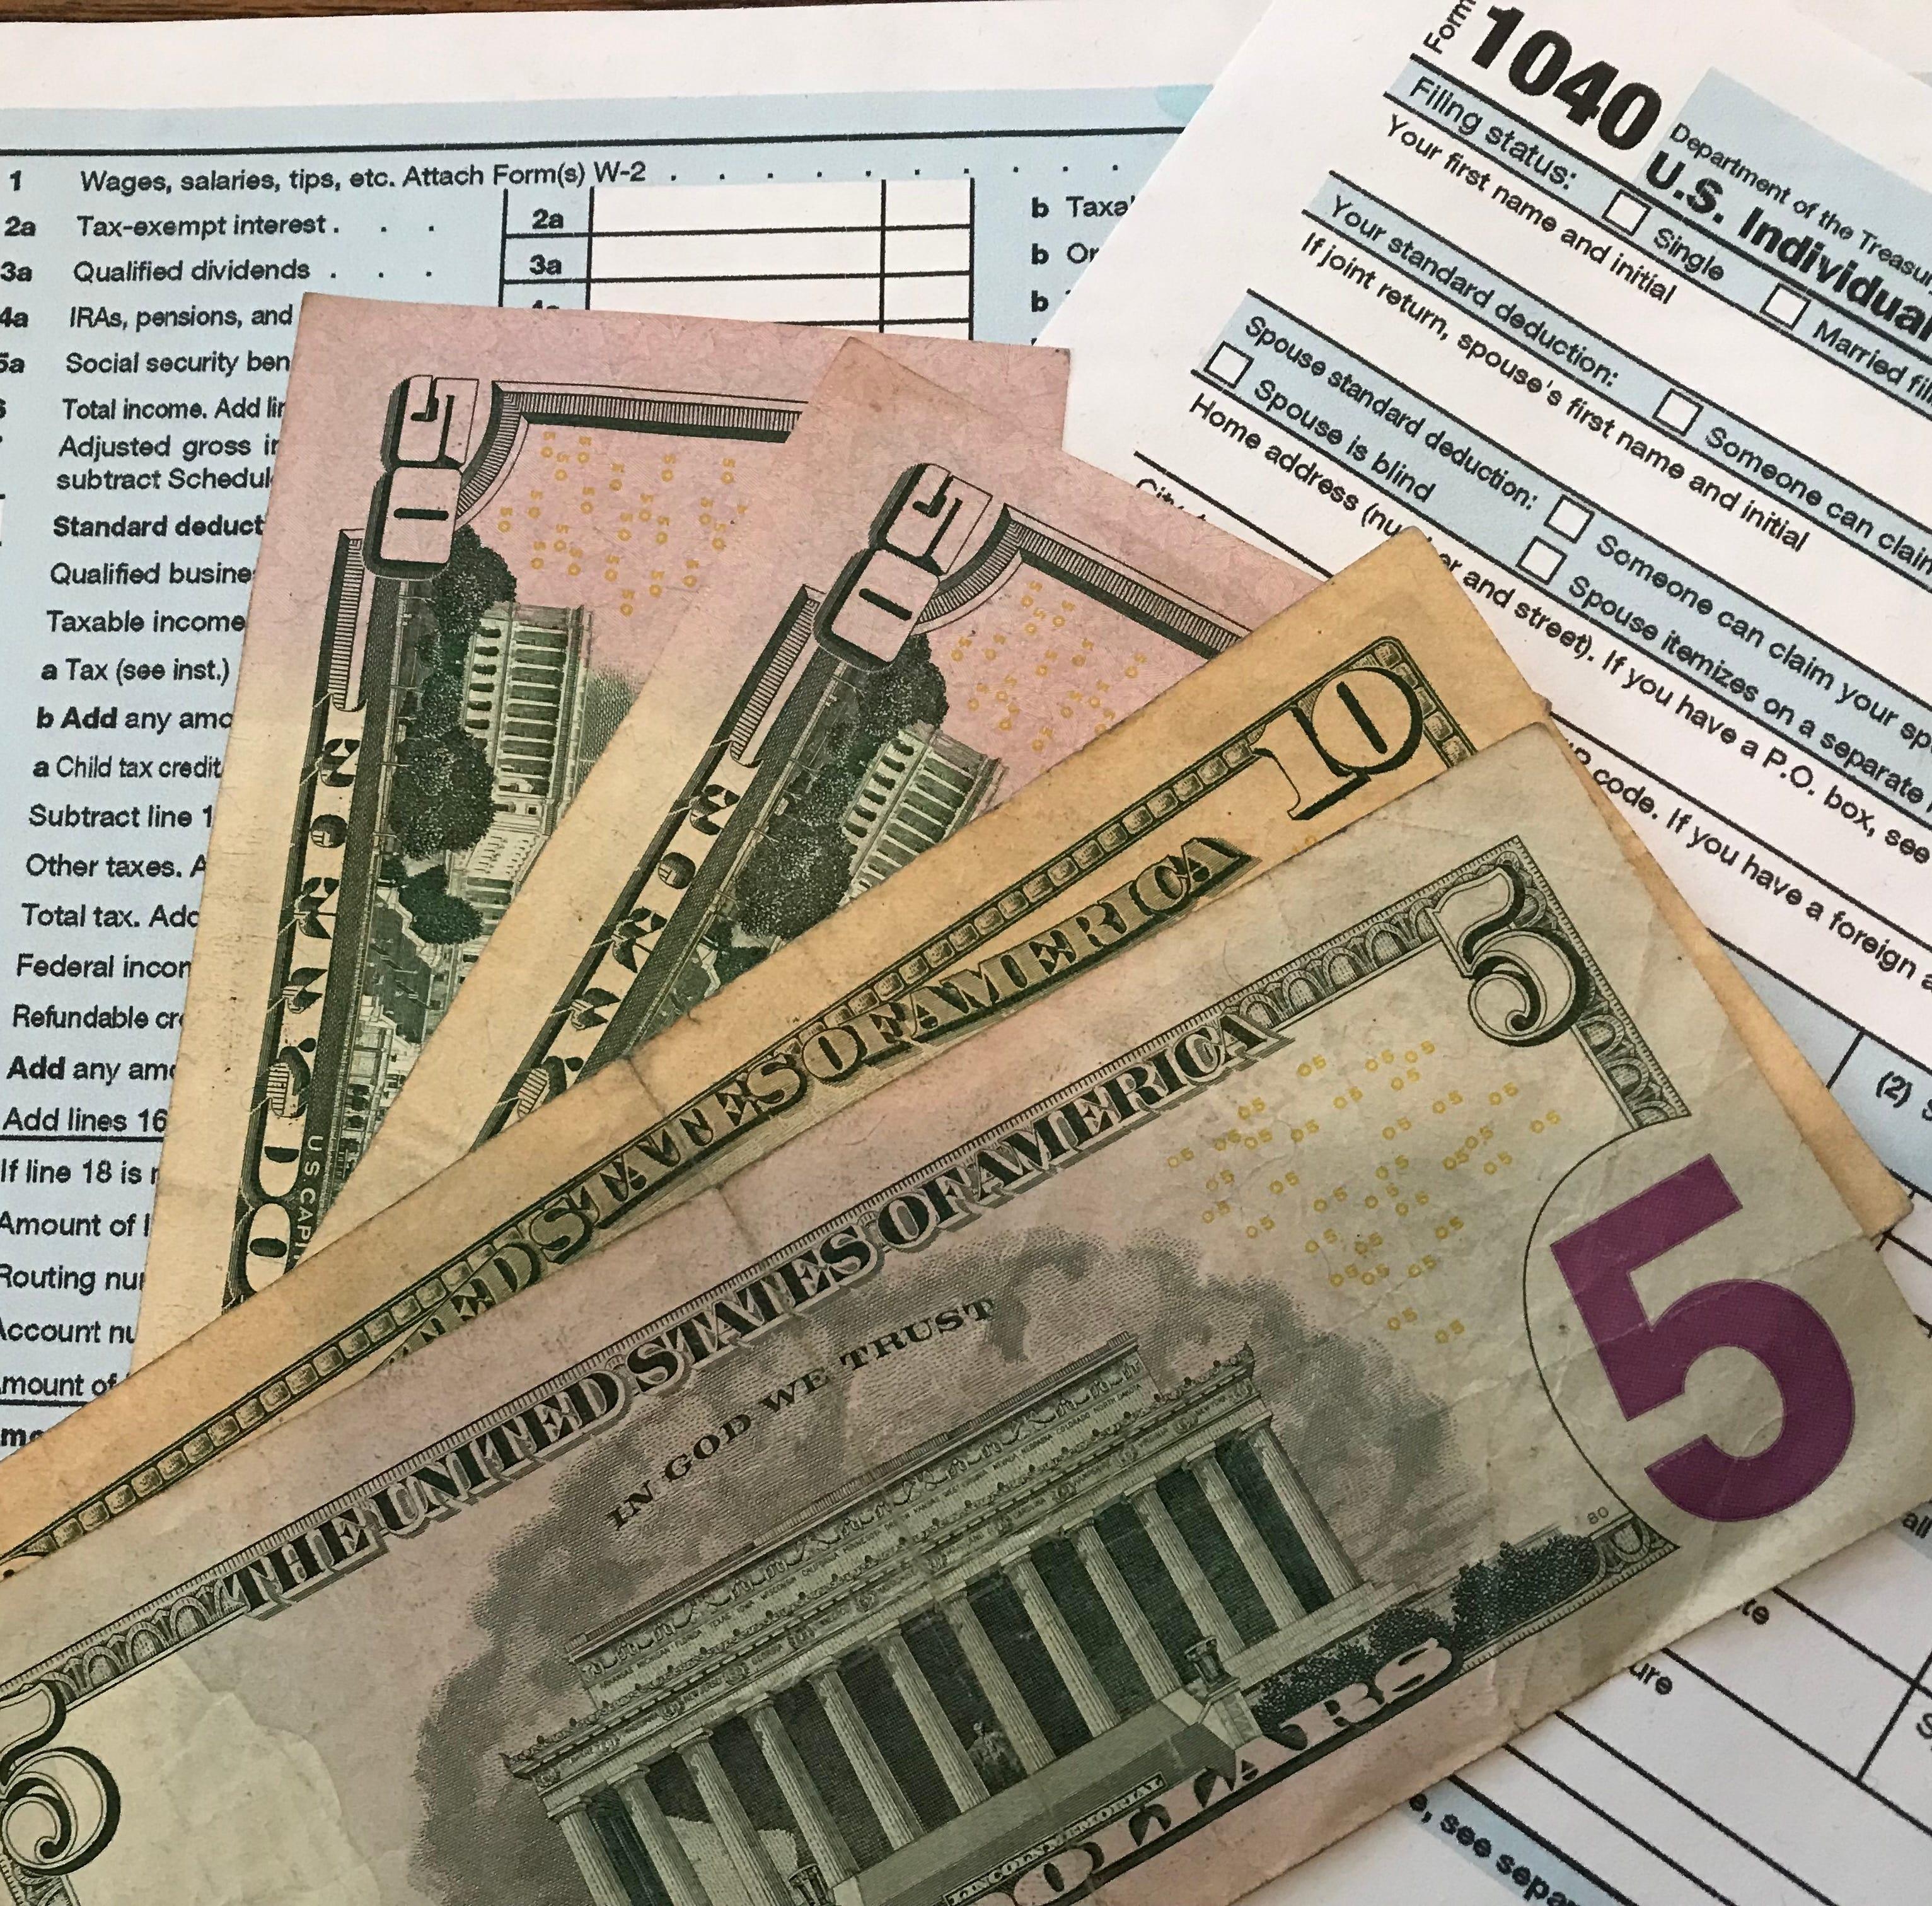 New IRS data: Average tax refunds down 16.7 percent